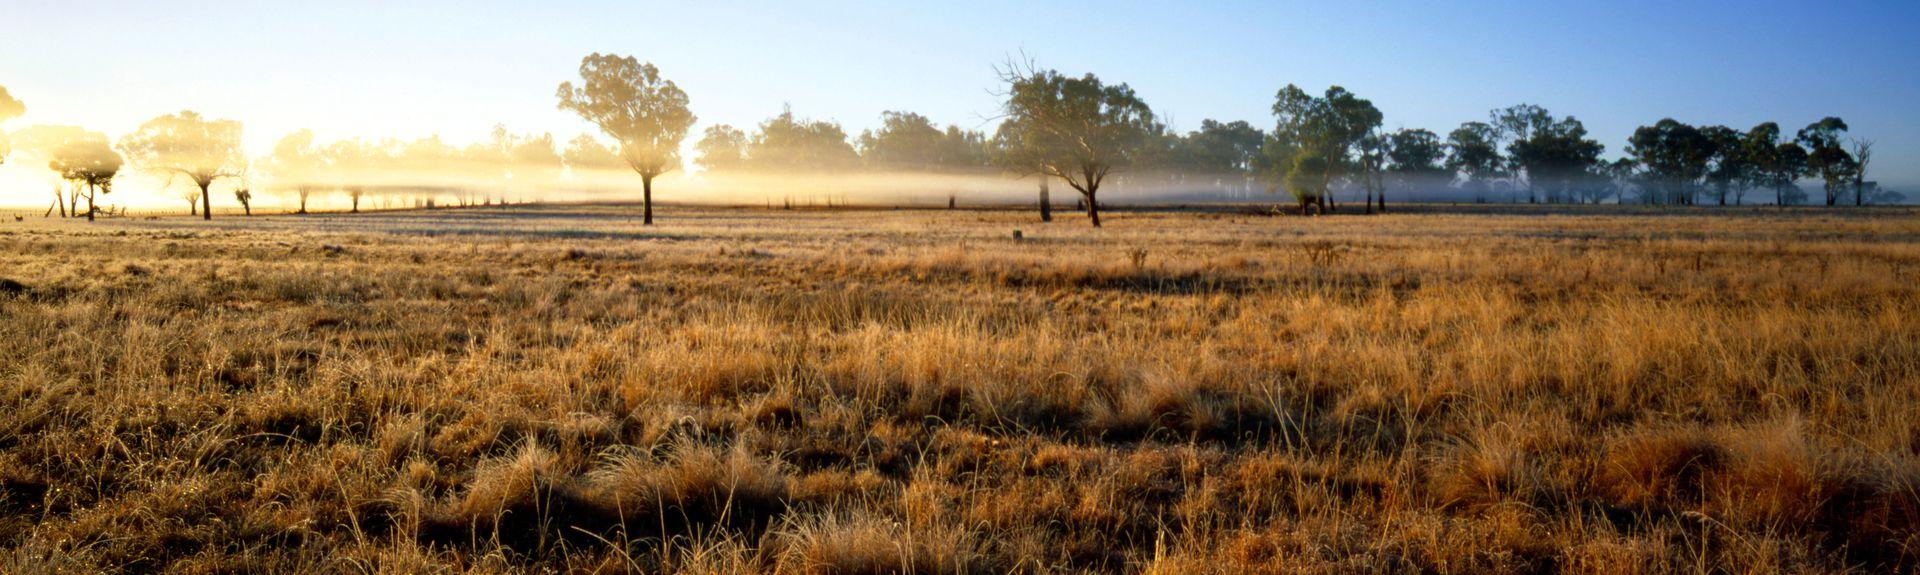 Armidale, New South Wales, Australien